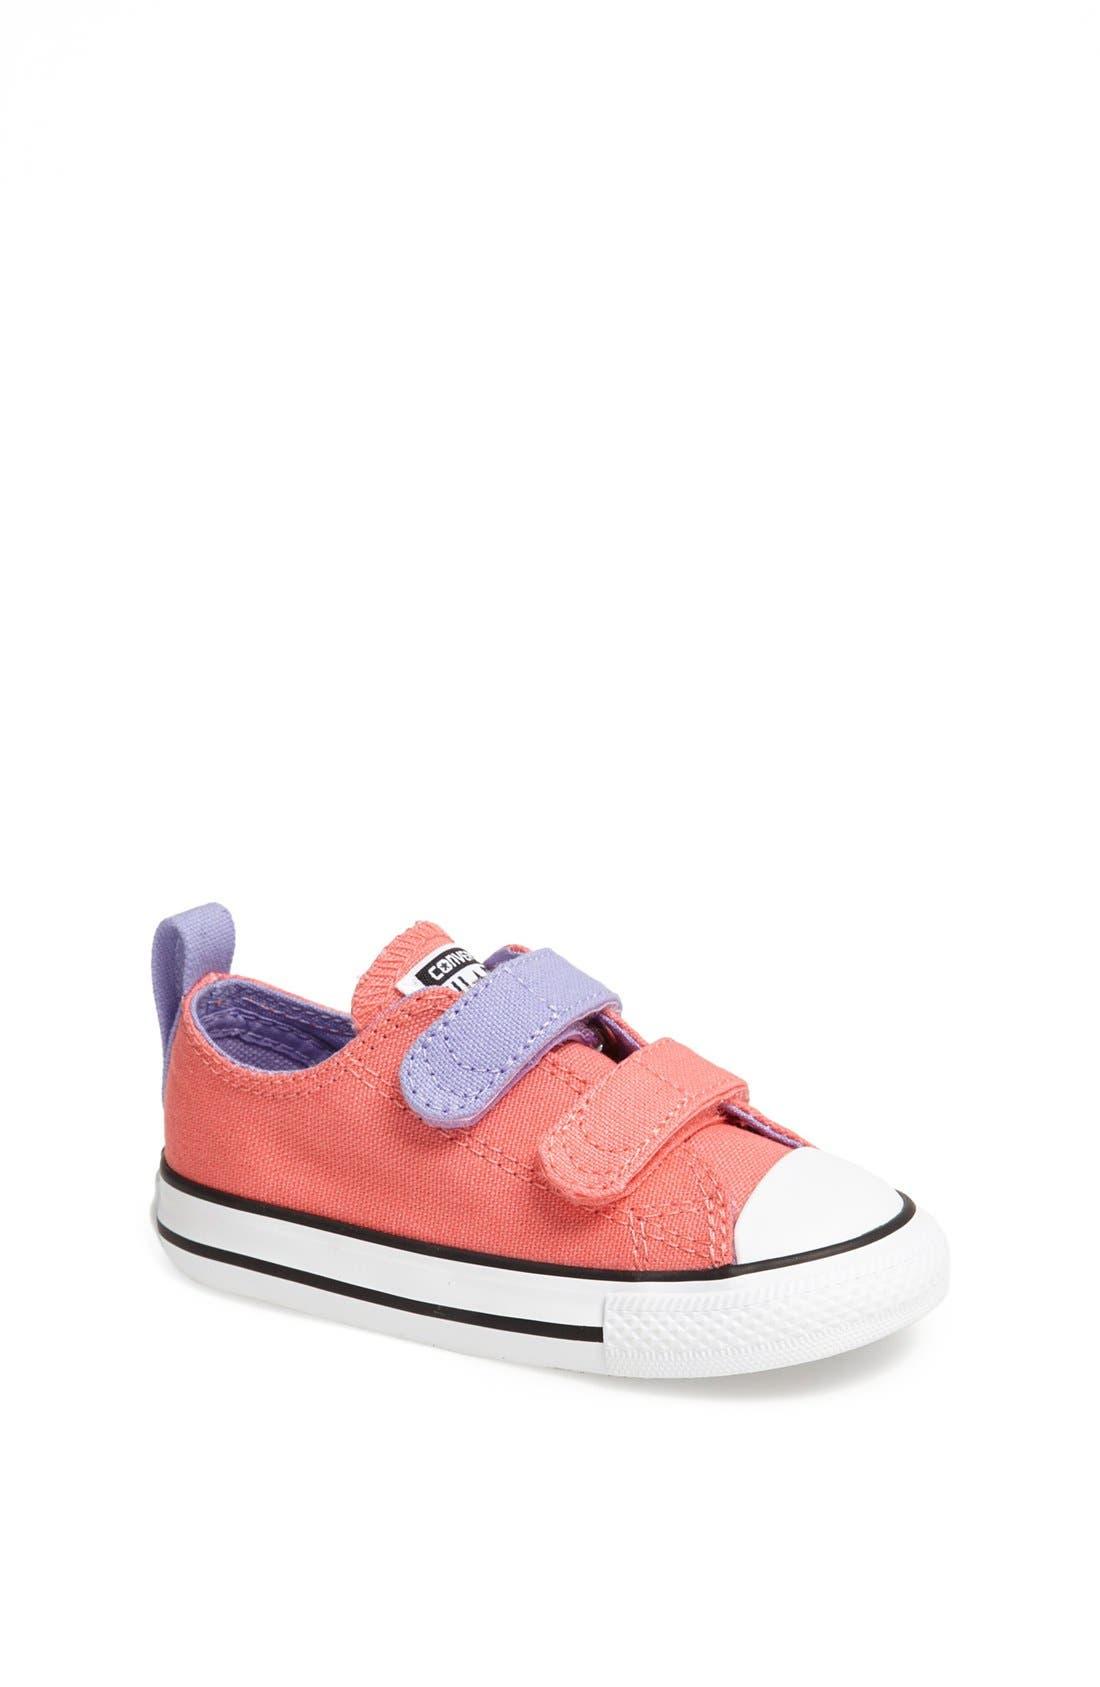 Alternate Image 1 Selected - Converse Chuck Taylor® All Star® '2V' Sneaker (Baby, Walker & Toddler)